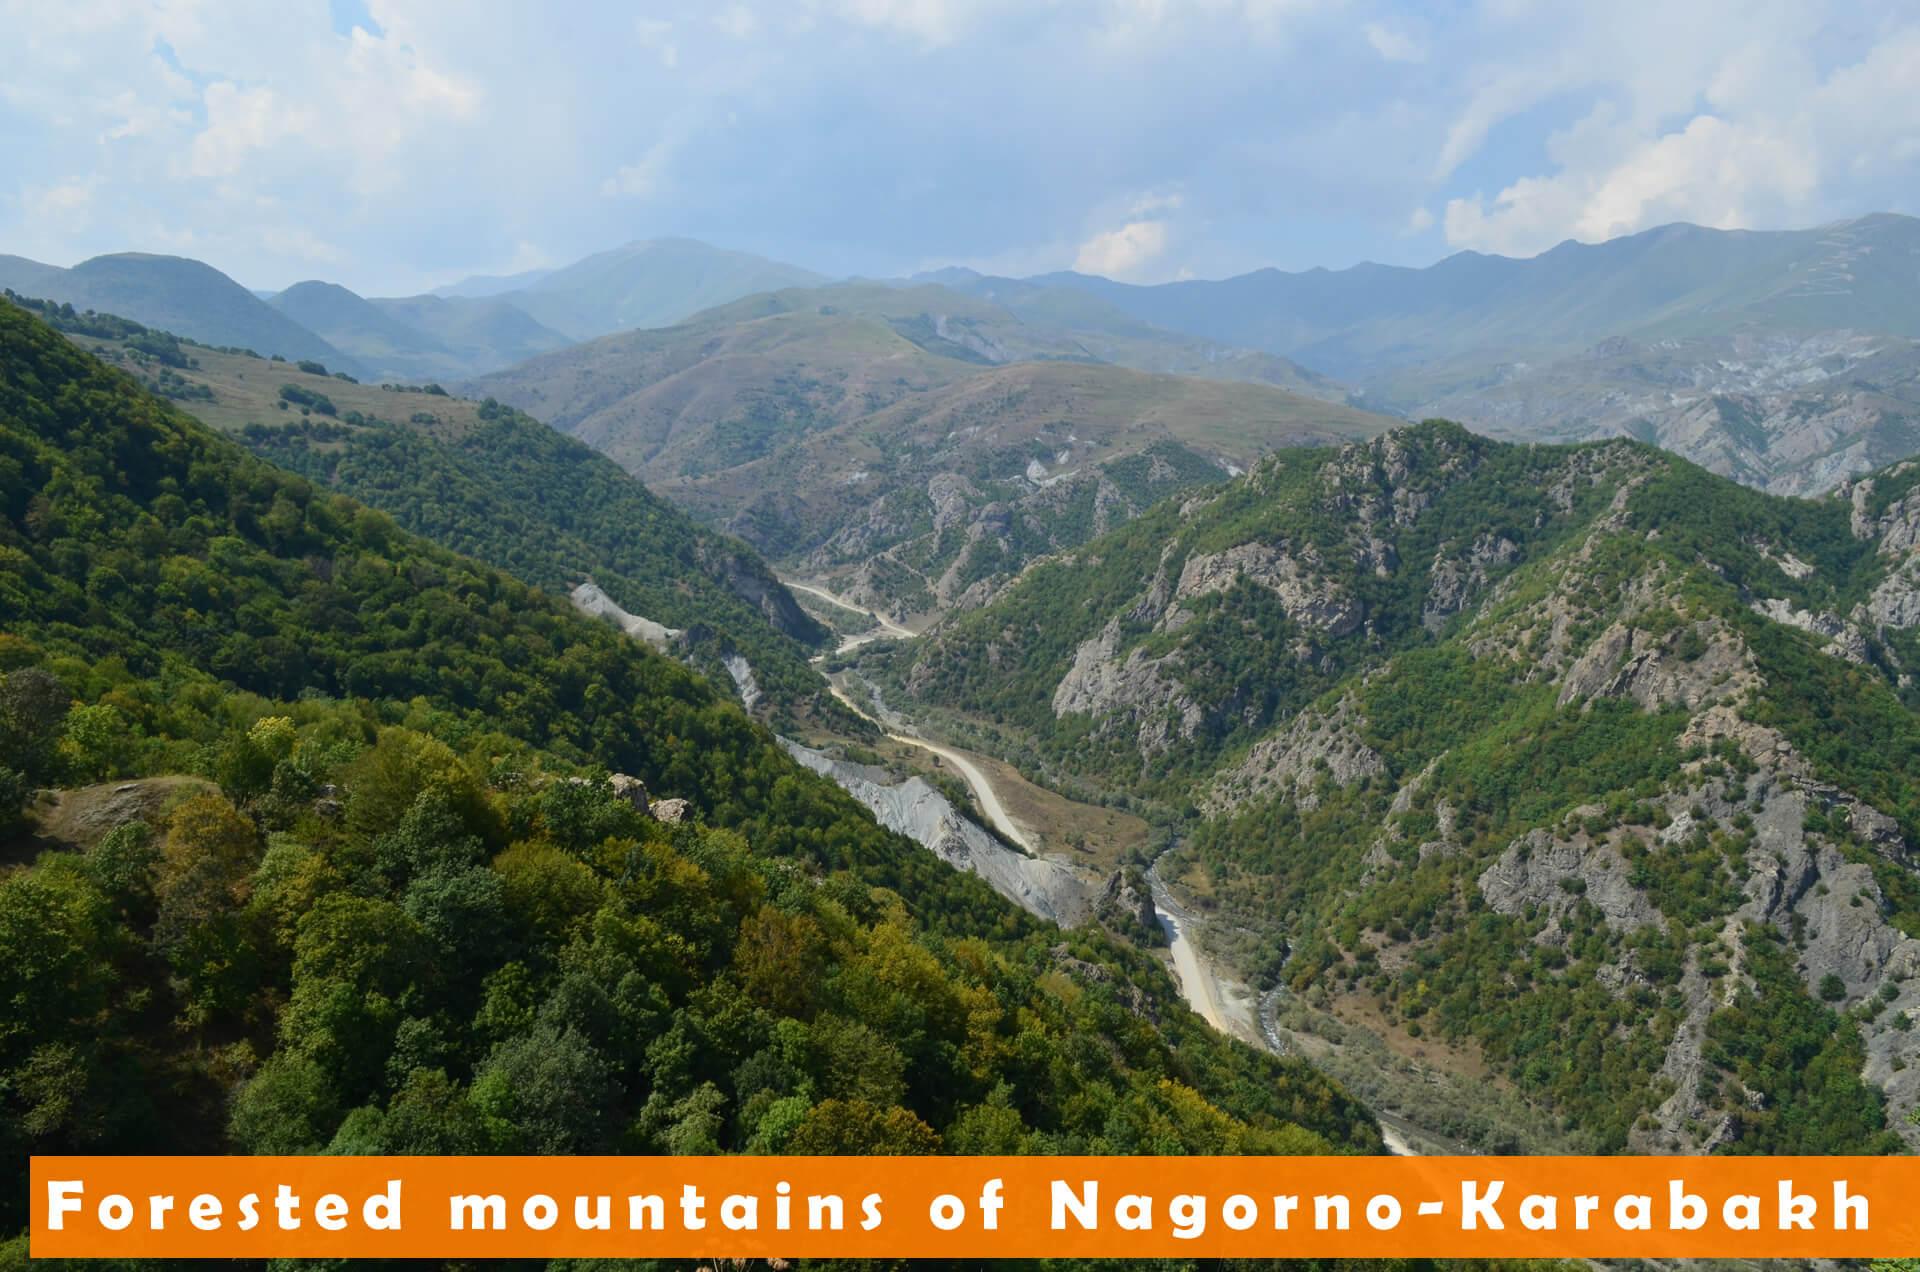 Forested mountains of Nagorno-Karabakh